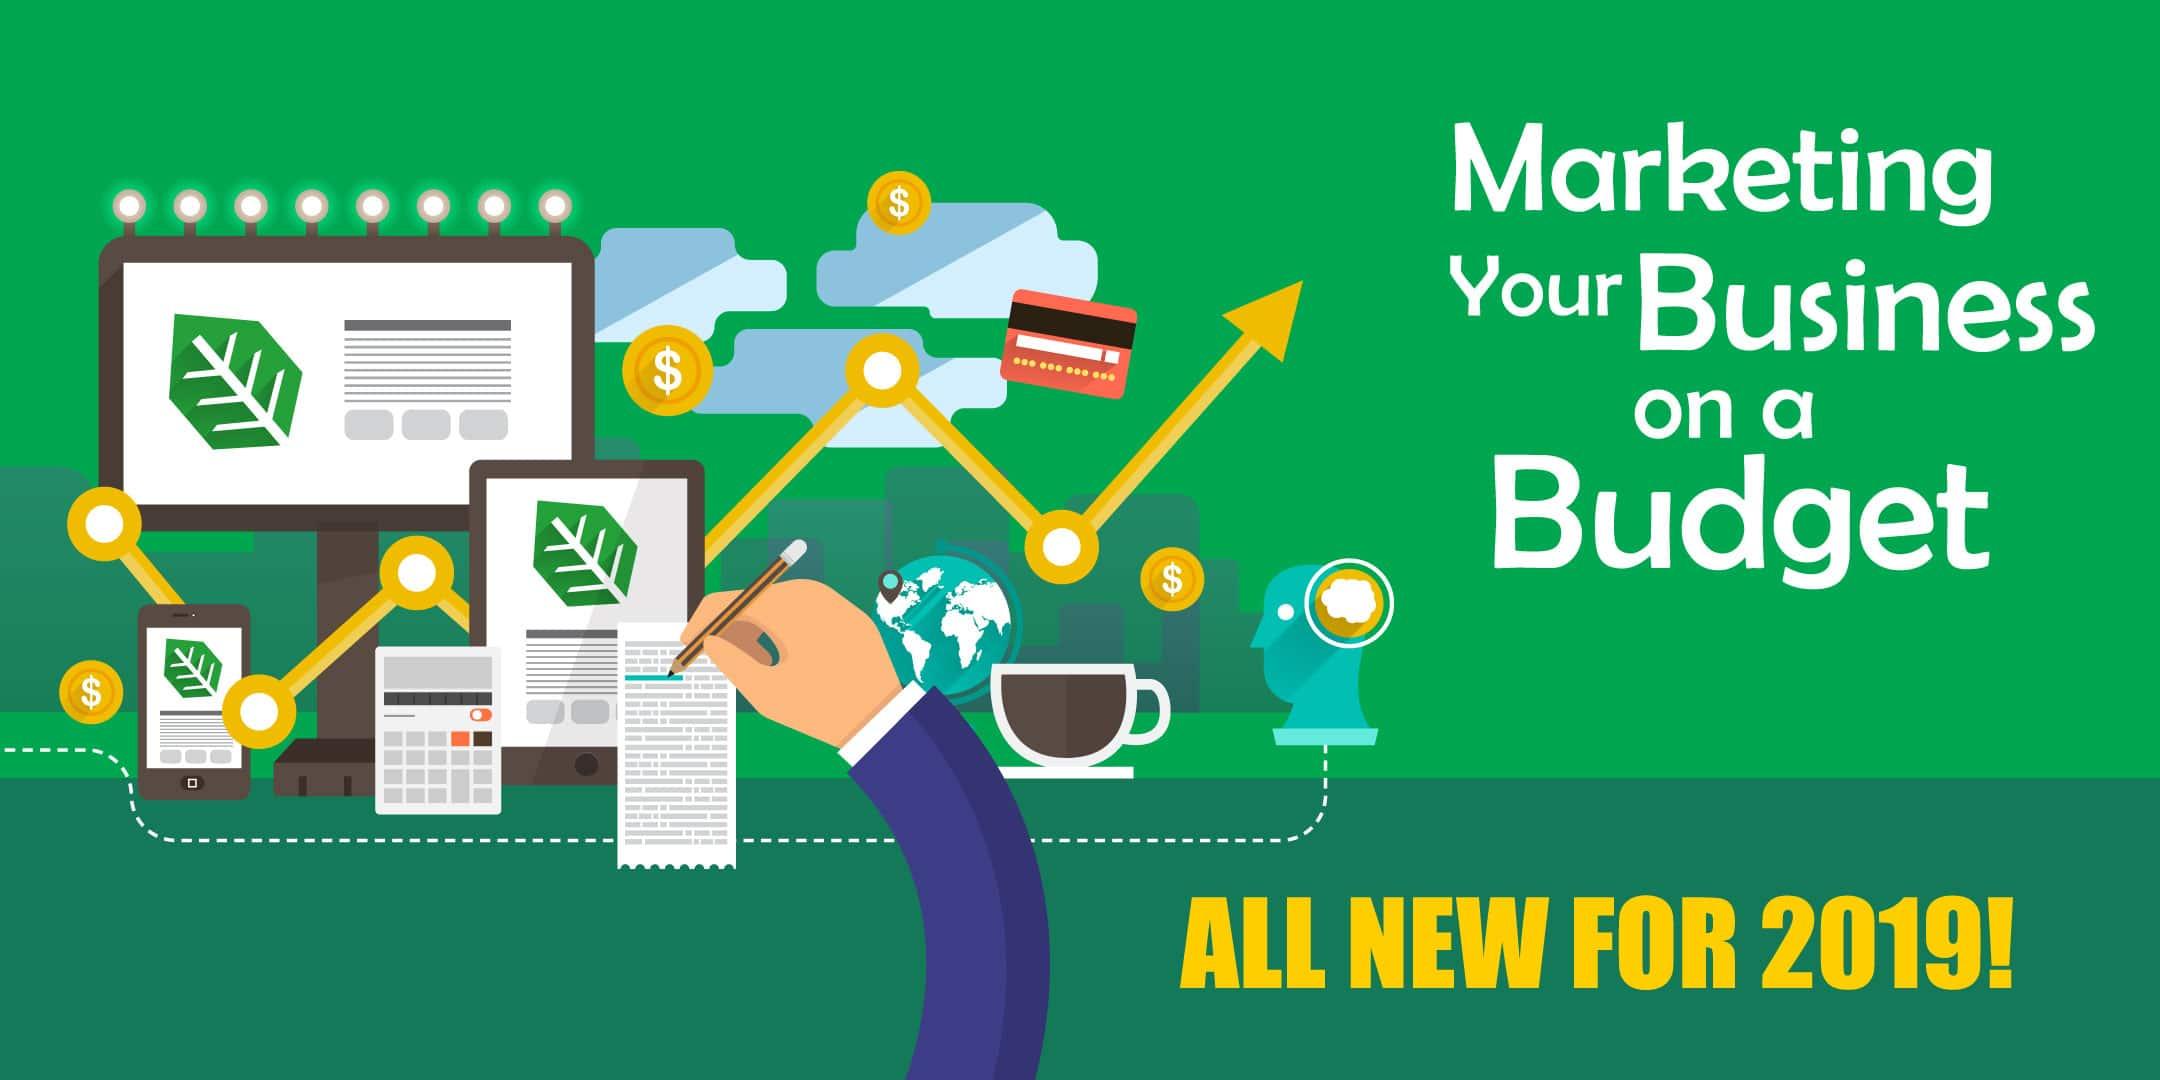 marketing on a budget header